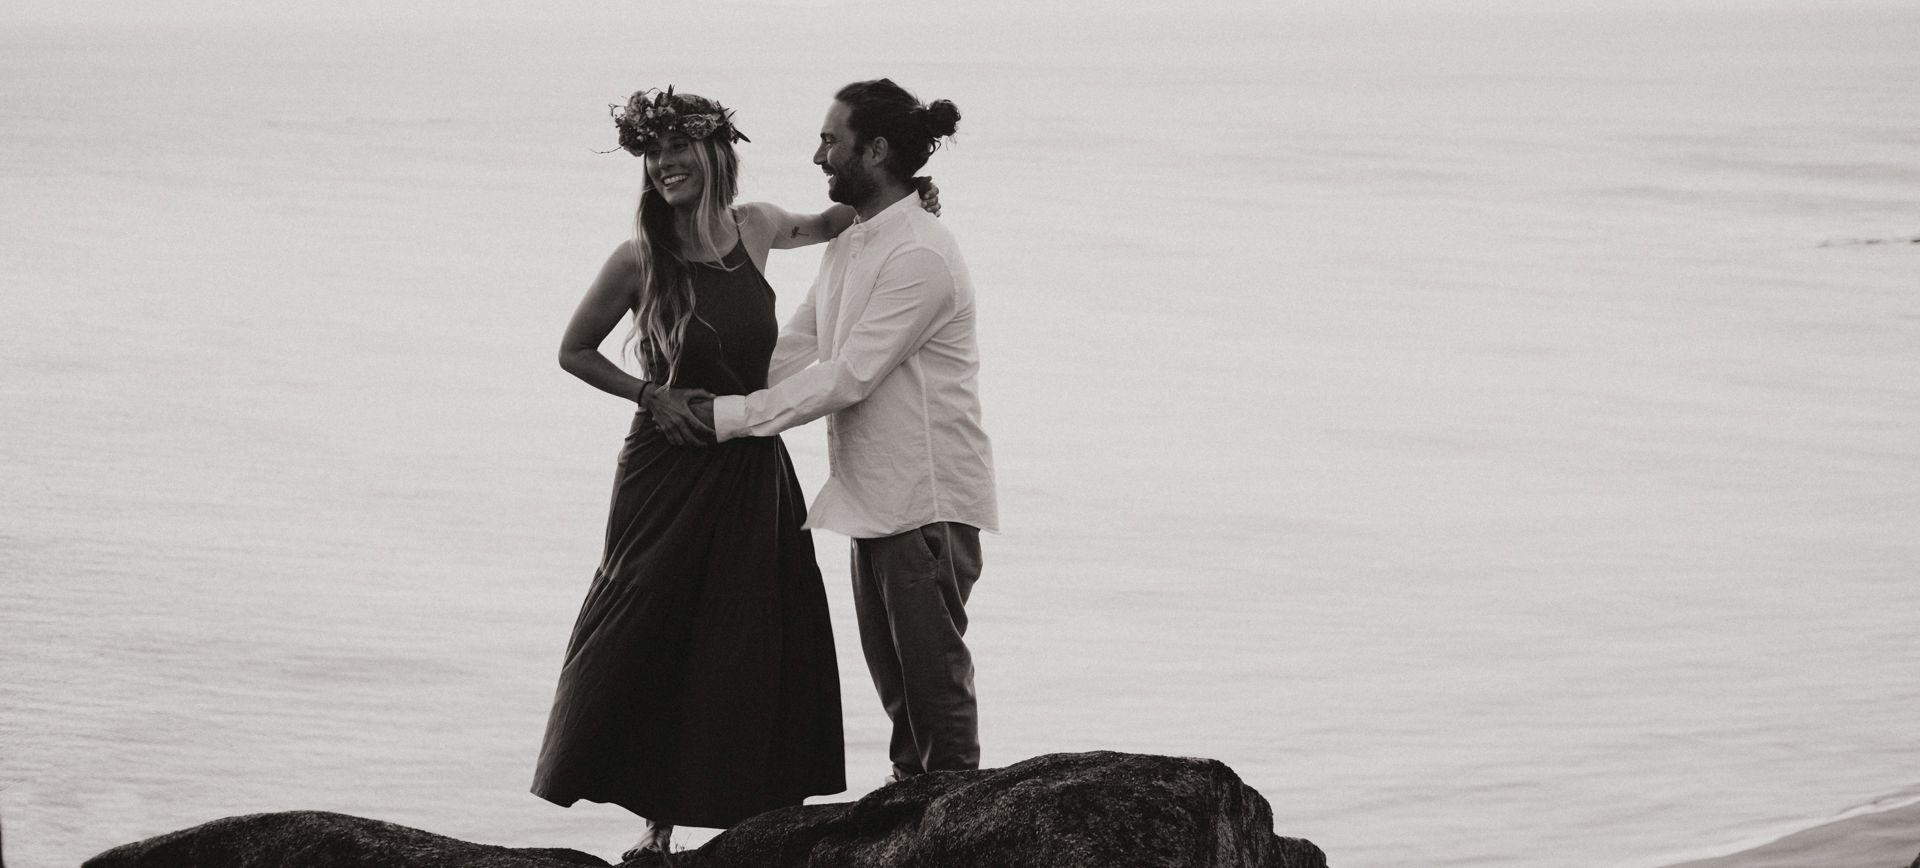 galicia elopement wedding in spain - have a 3 day adventure wedding